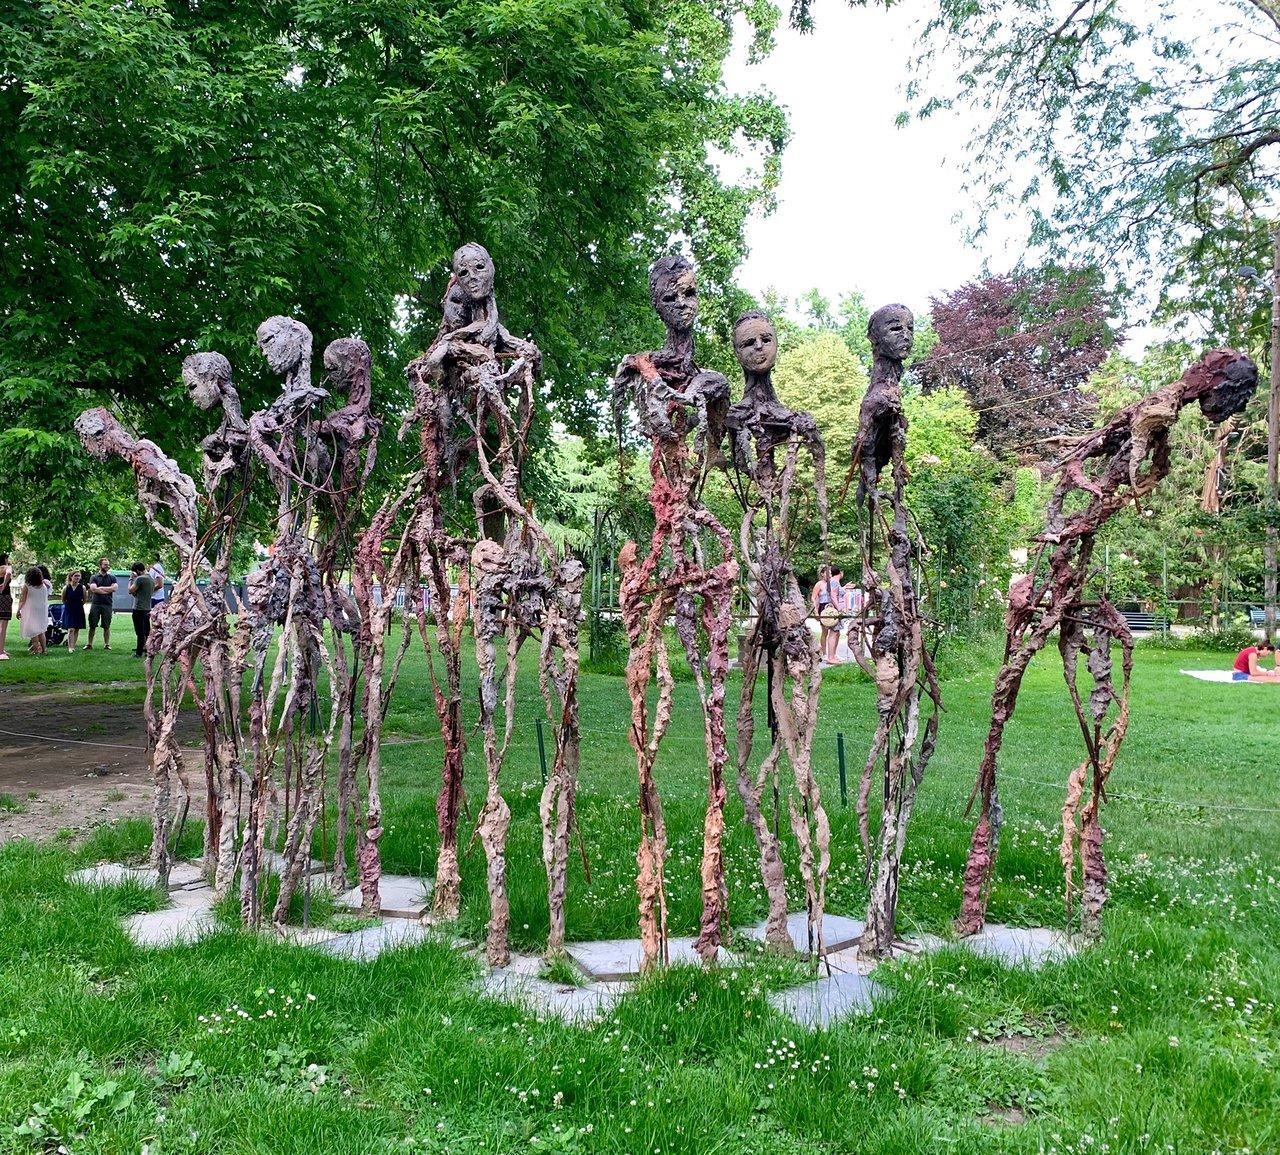 "2020å¹´ Jardin Des Plantes È¡Œãå‰ã« Ȧ‹ã©ã""ろをチェック Èリップアドバイザー"